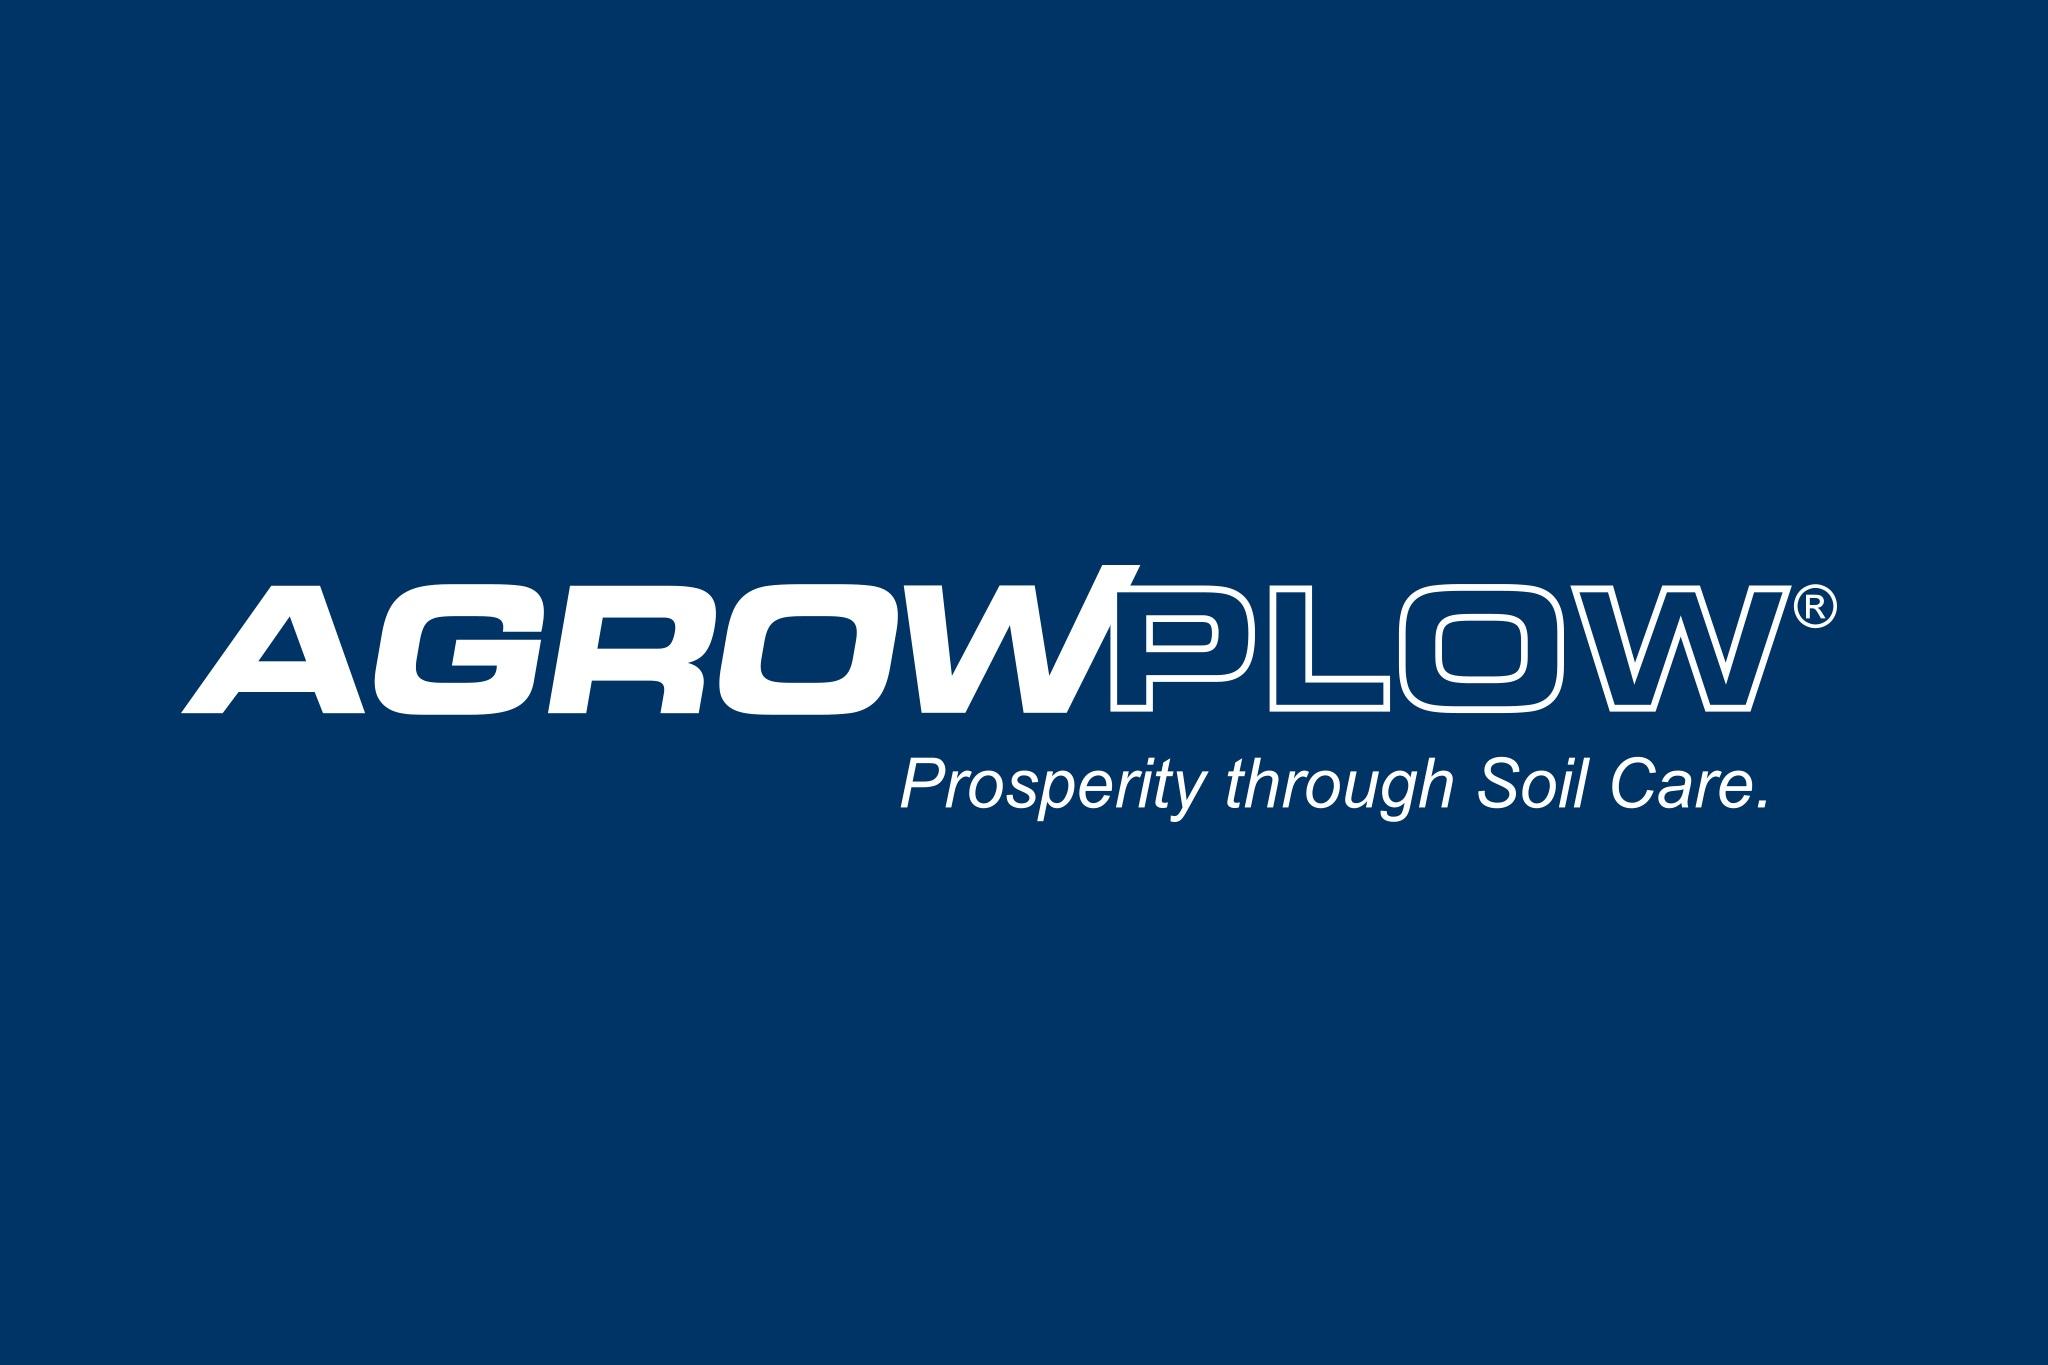 brands_logoagrowplow.jpg